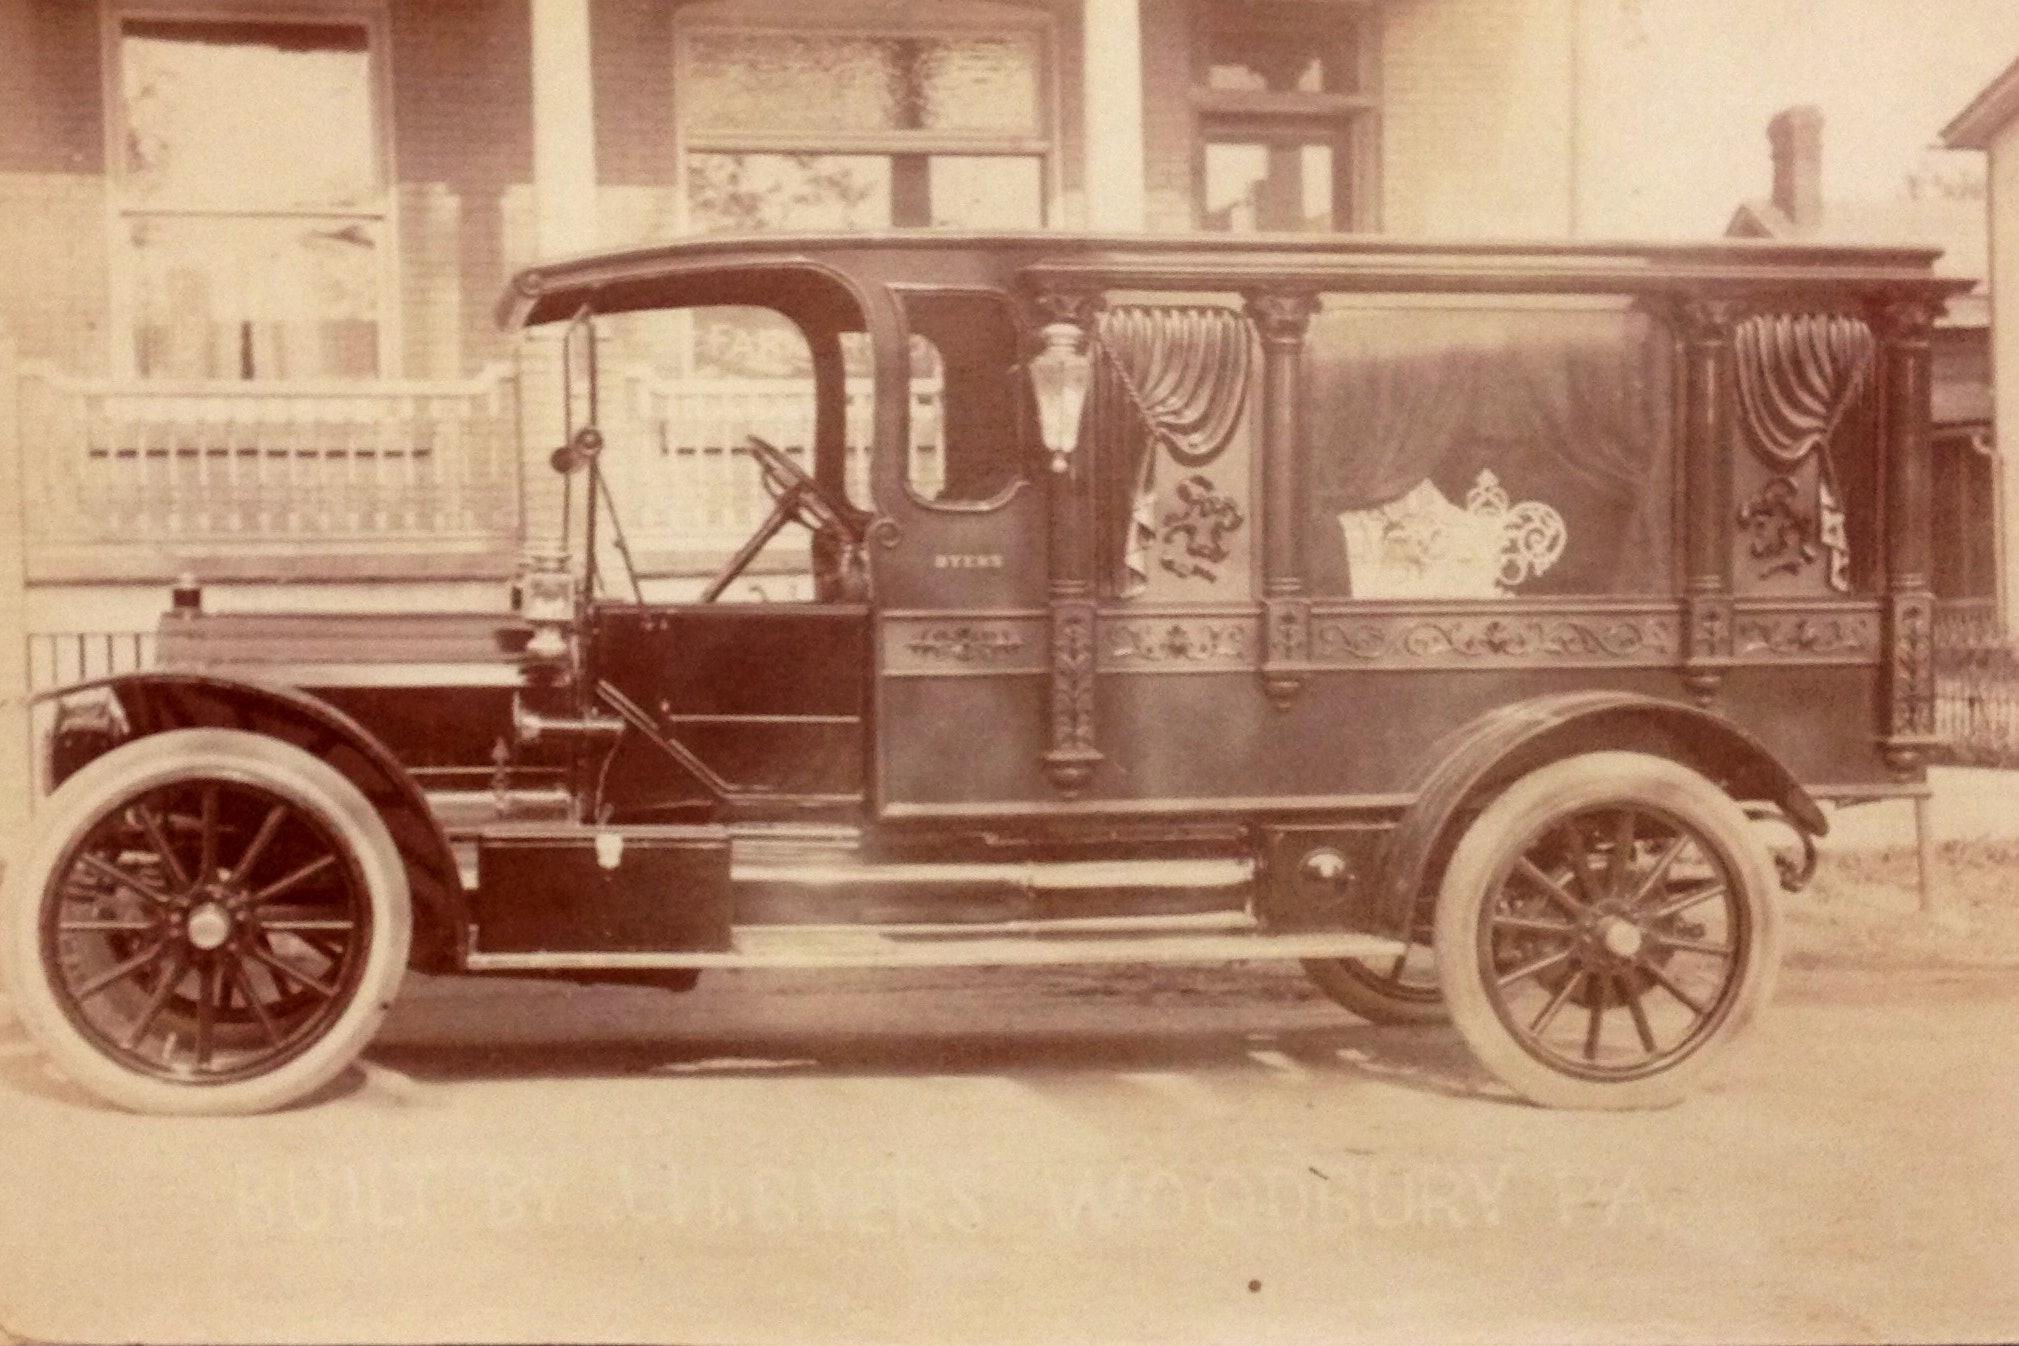 1925 Ford Model T (Truck)